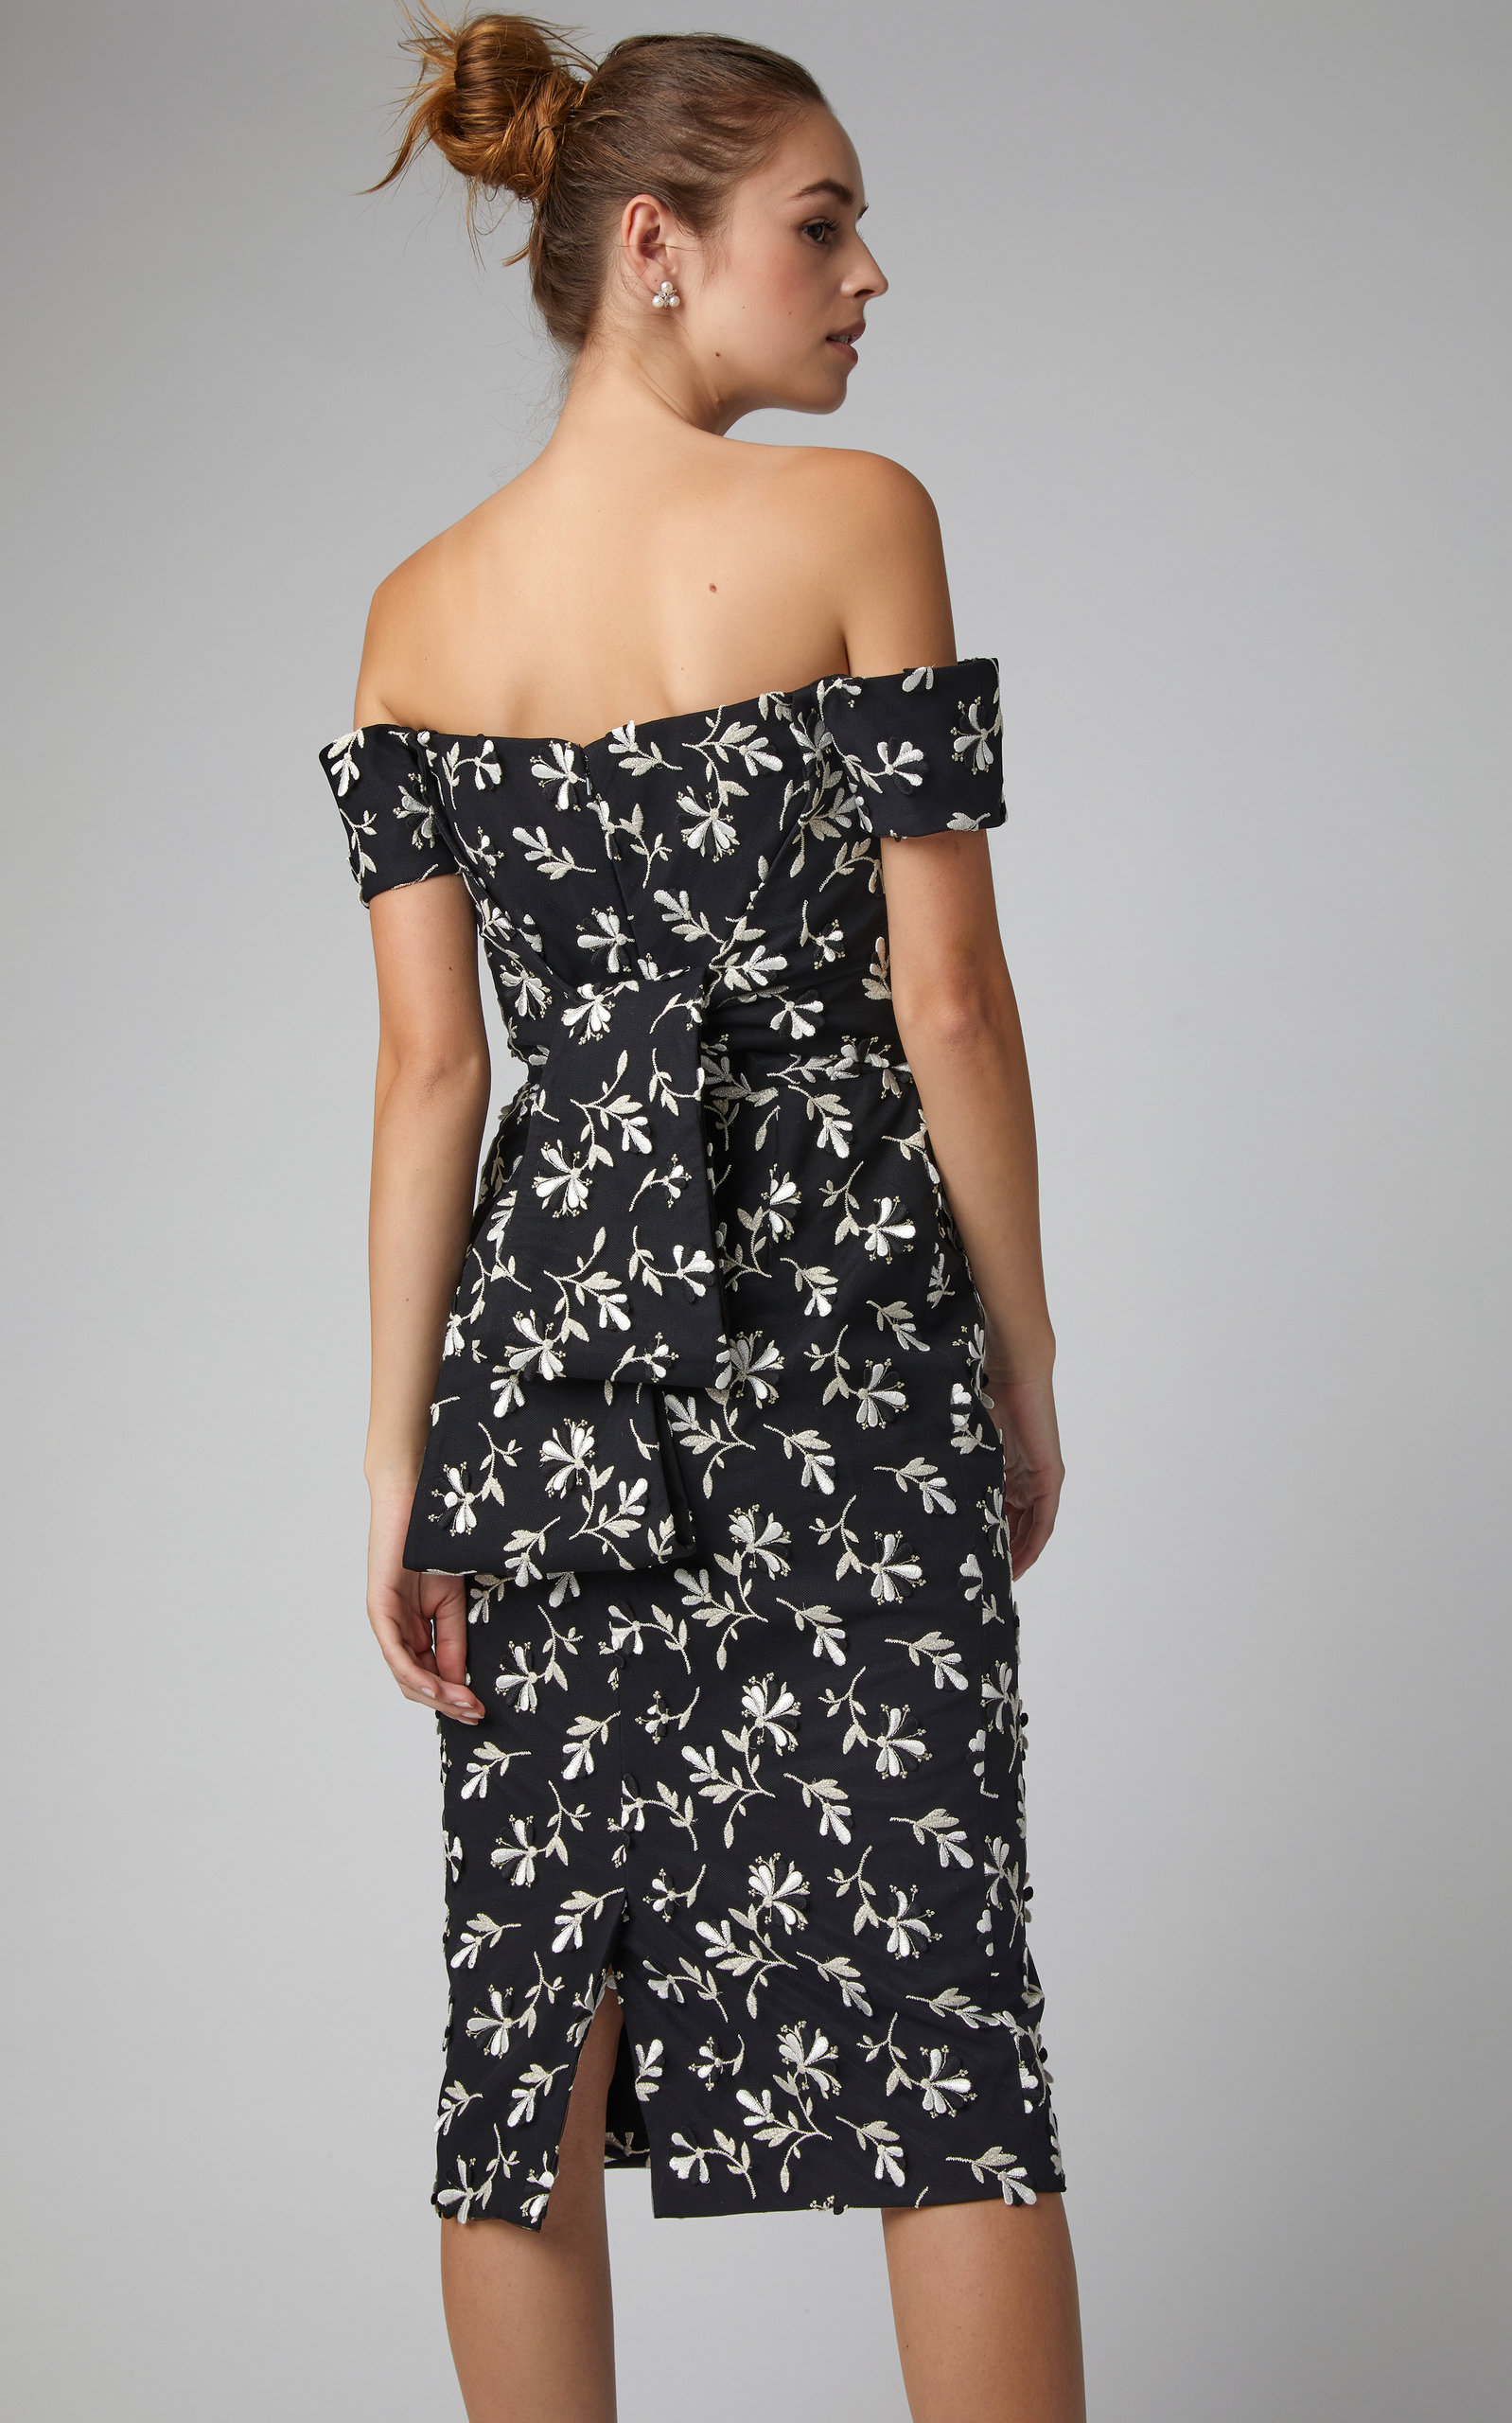 76df124b5f3e Lela RoseOff-The-Shoulder Floral-Embroidered Crepe Dress. CLOSE. Loading